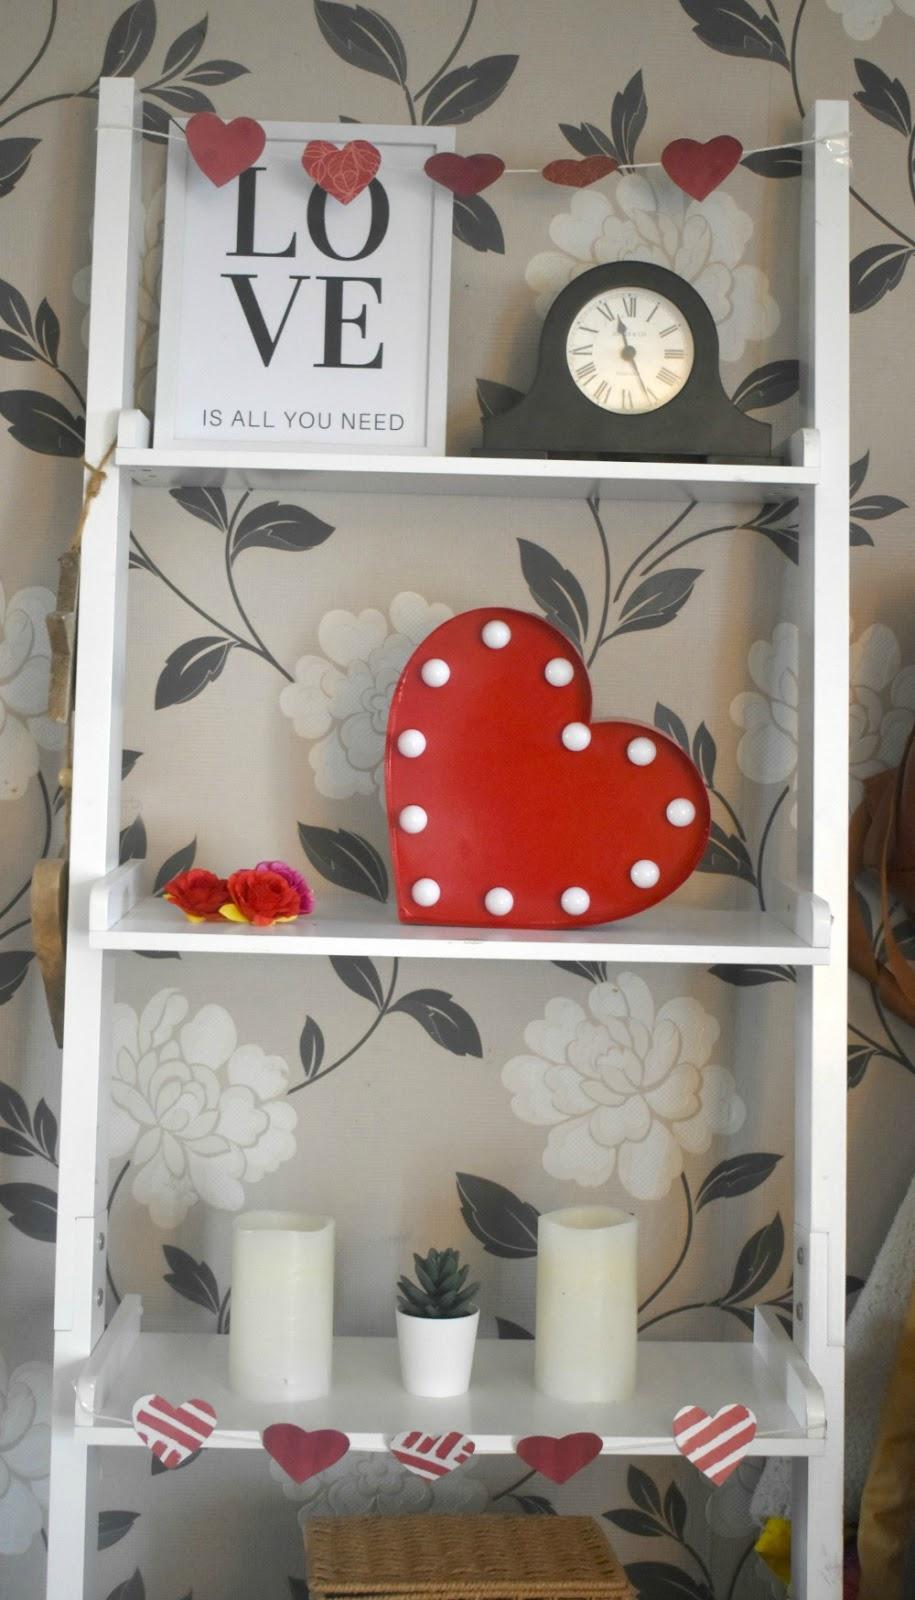 3 Fun Homemade Valentines Day Decor Ideas